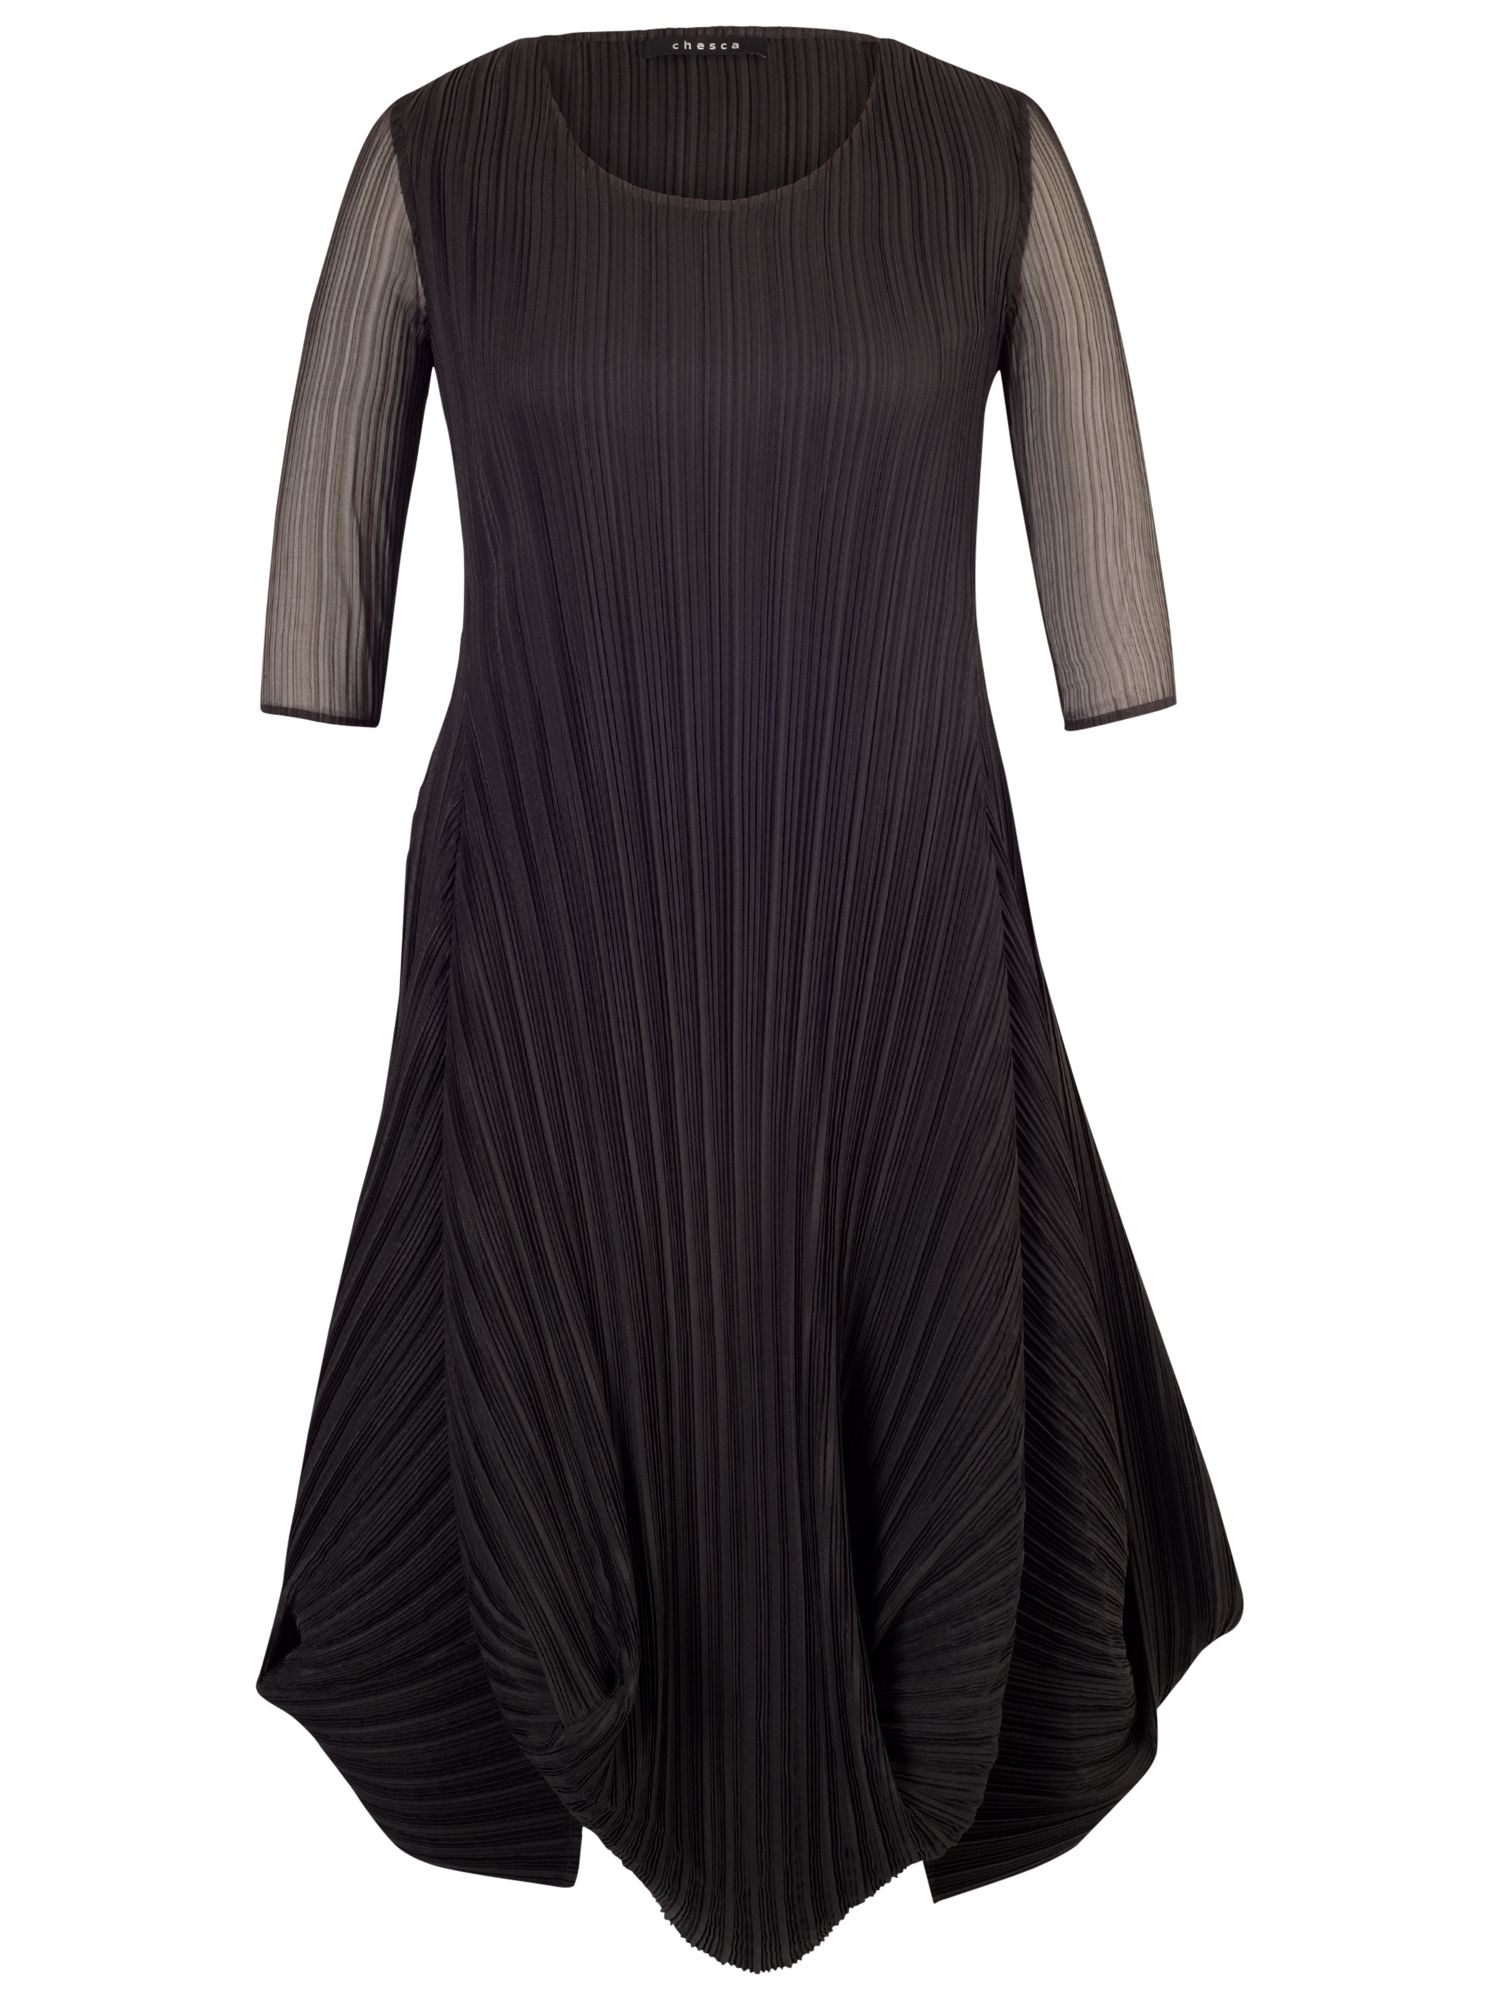 Chesca Chesca Black Crush Pleat Crepe Drape Hem Dress